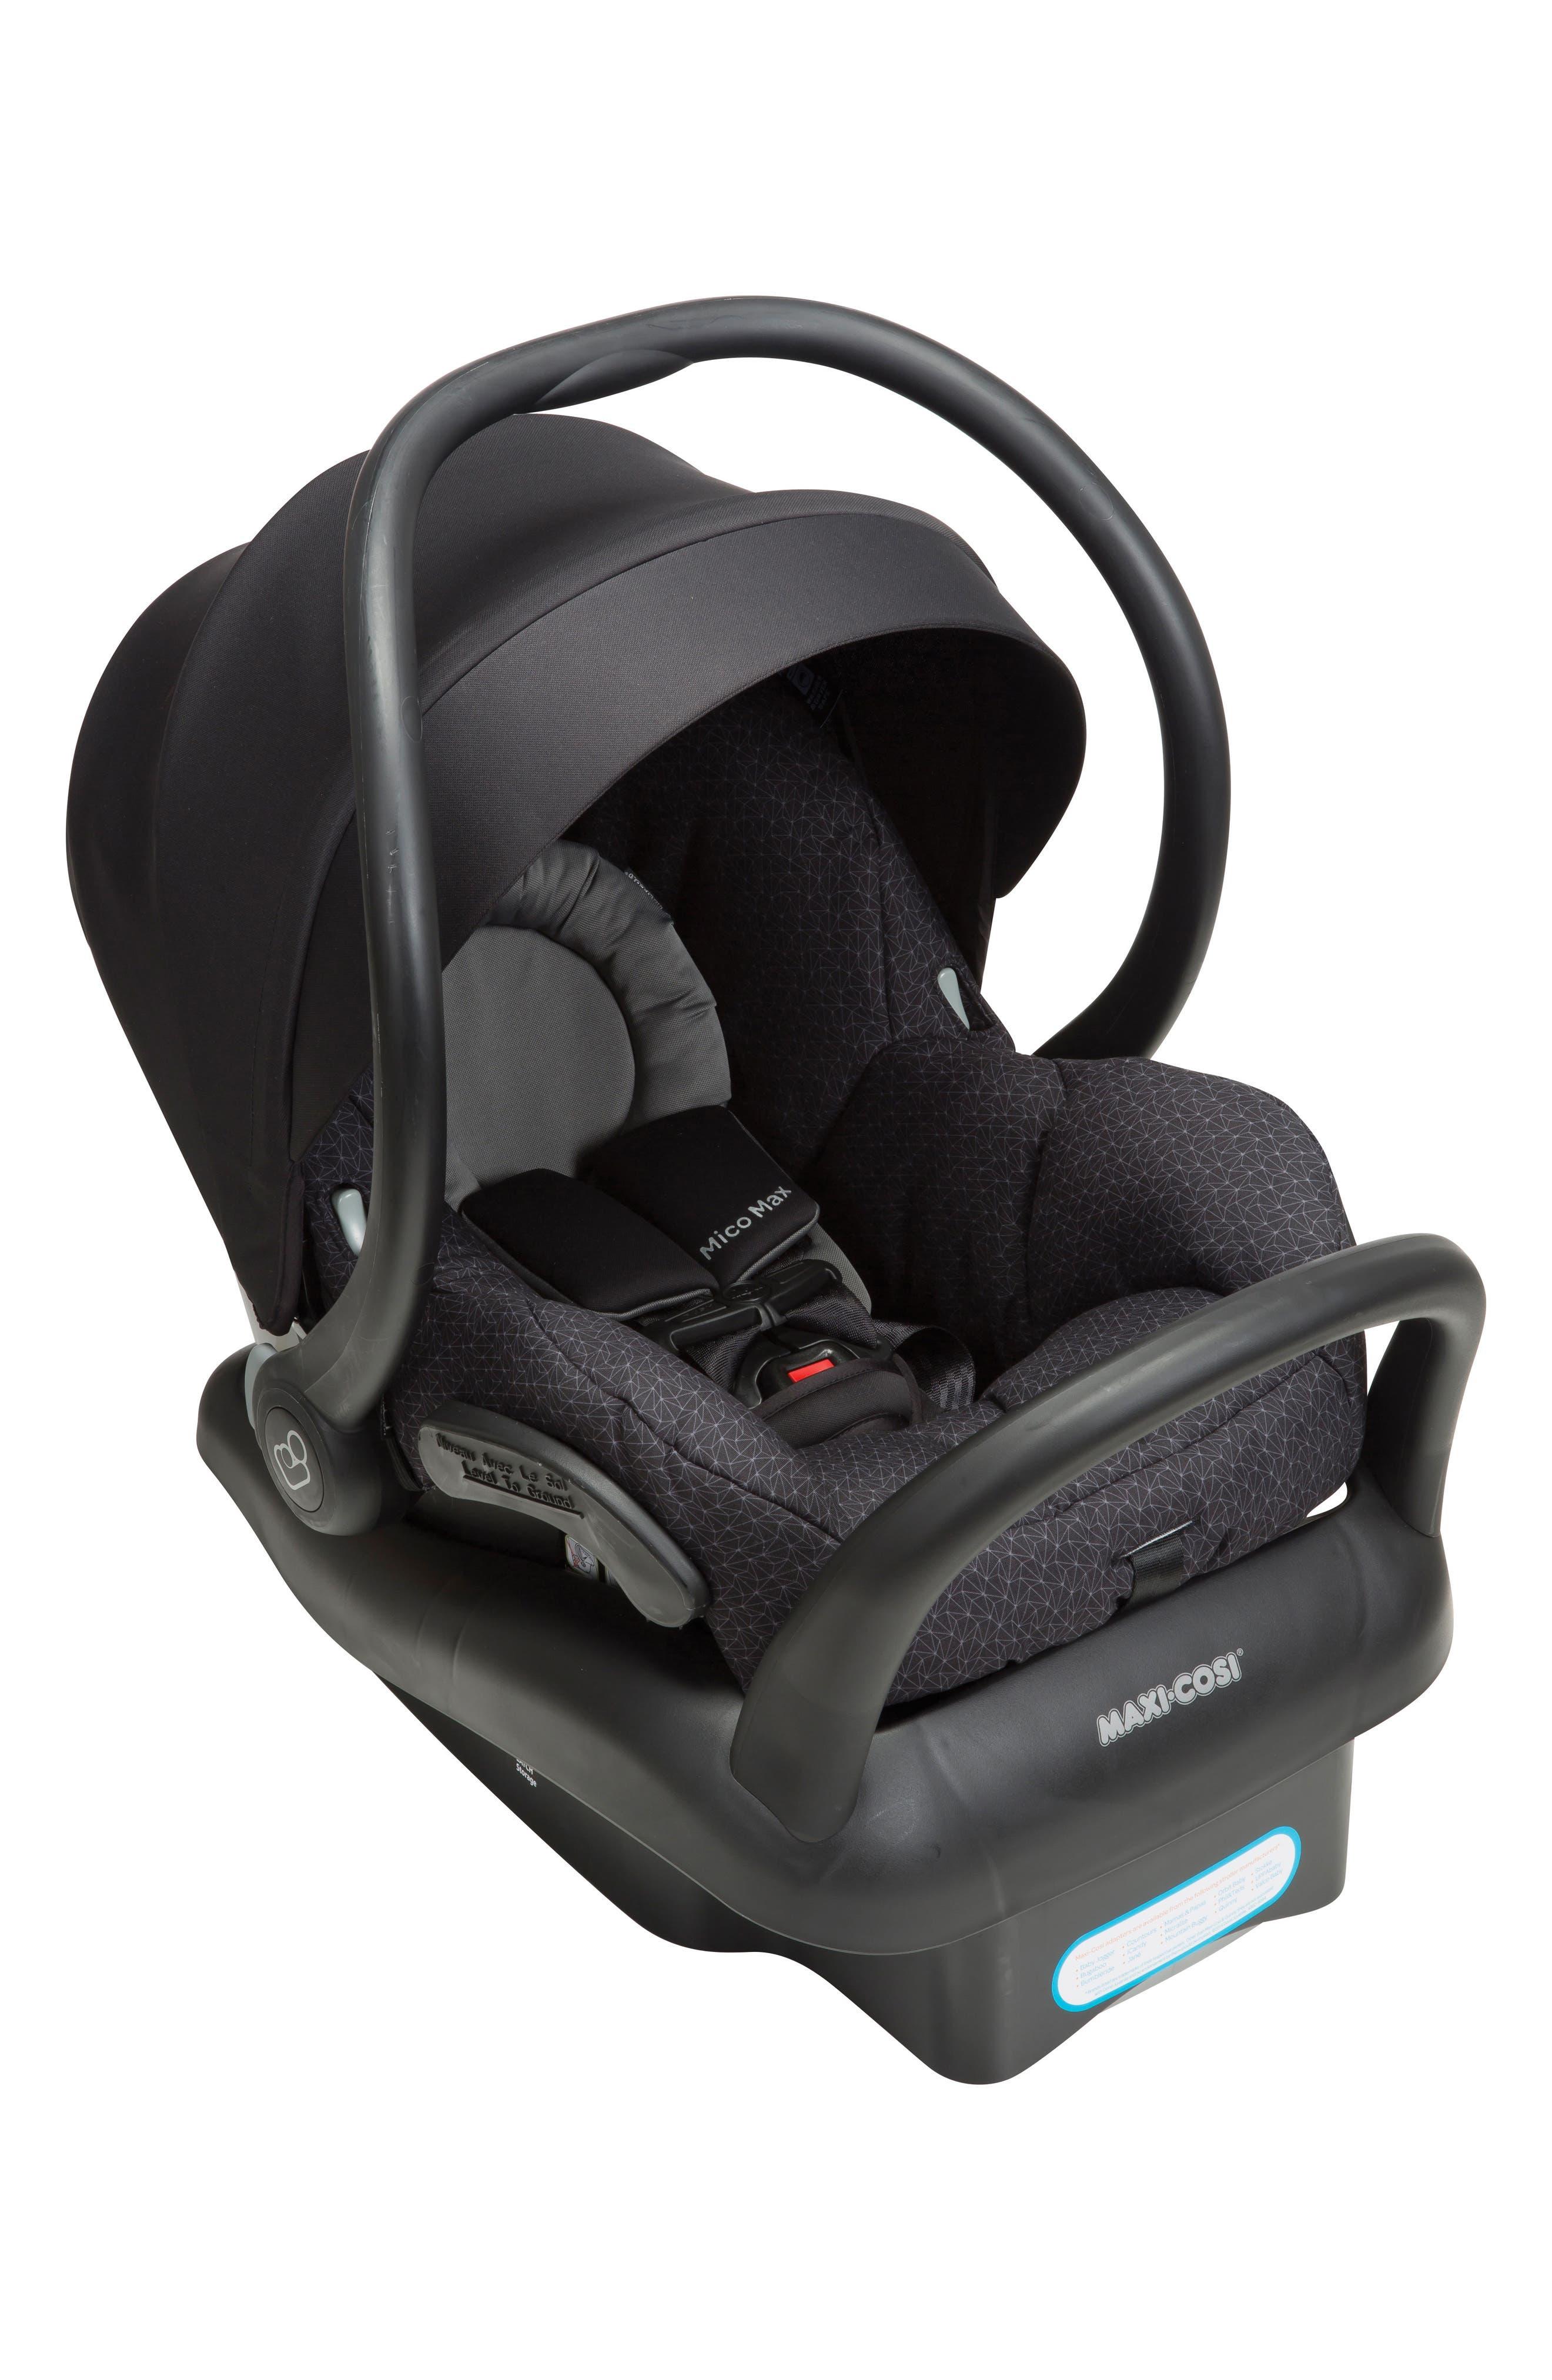 Mico Max 30 Infant Car Seat,                         Main,                         color, Black Crystal